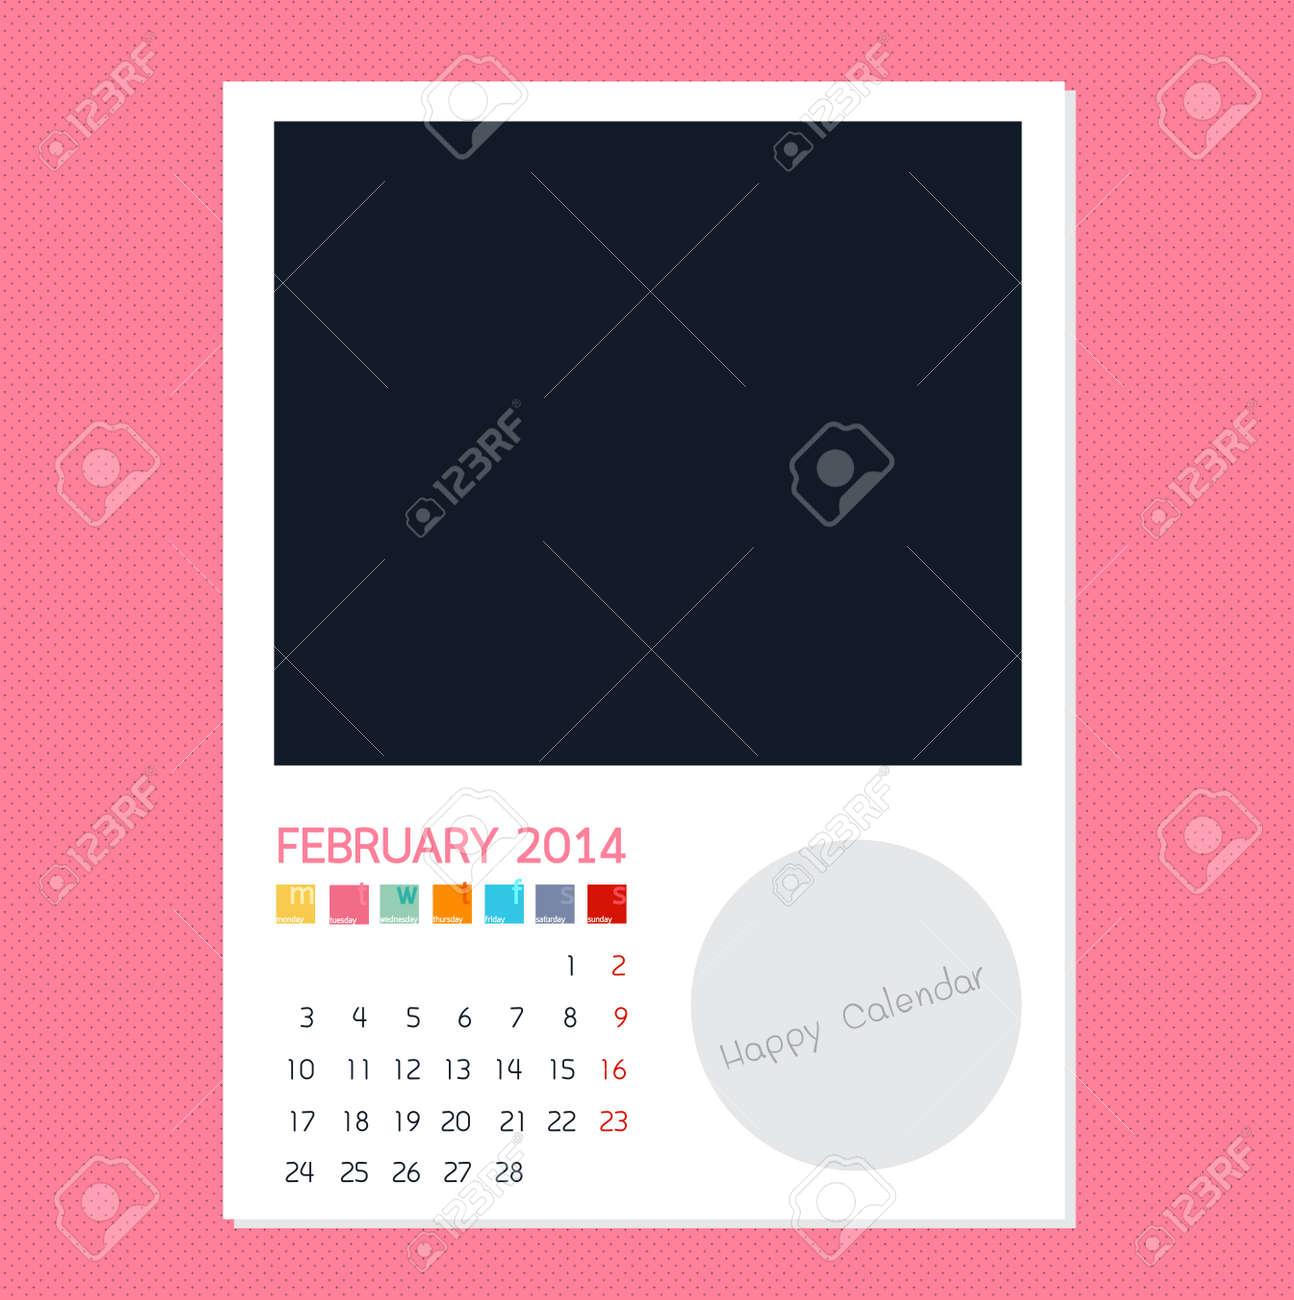 Calendar February 2014, Photo frame background Stock Vector - 28650855